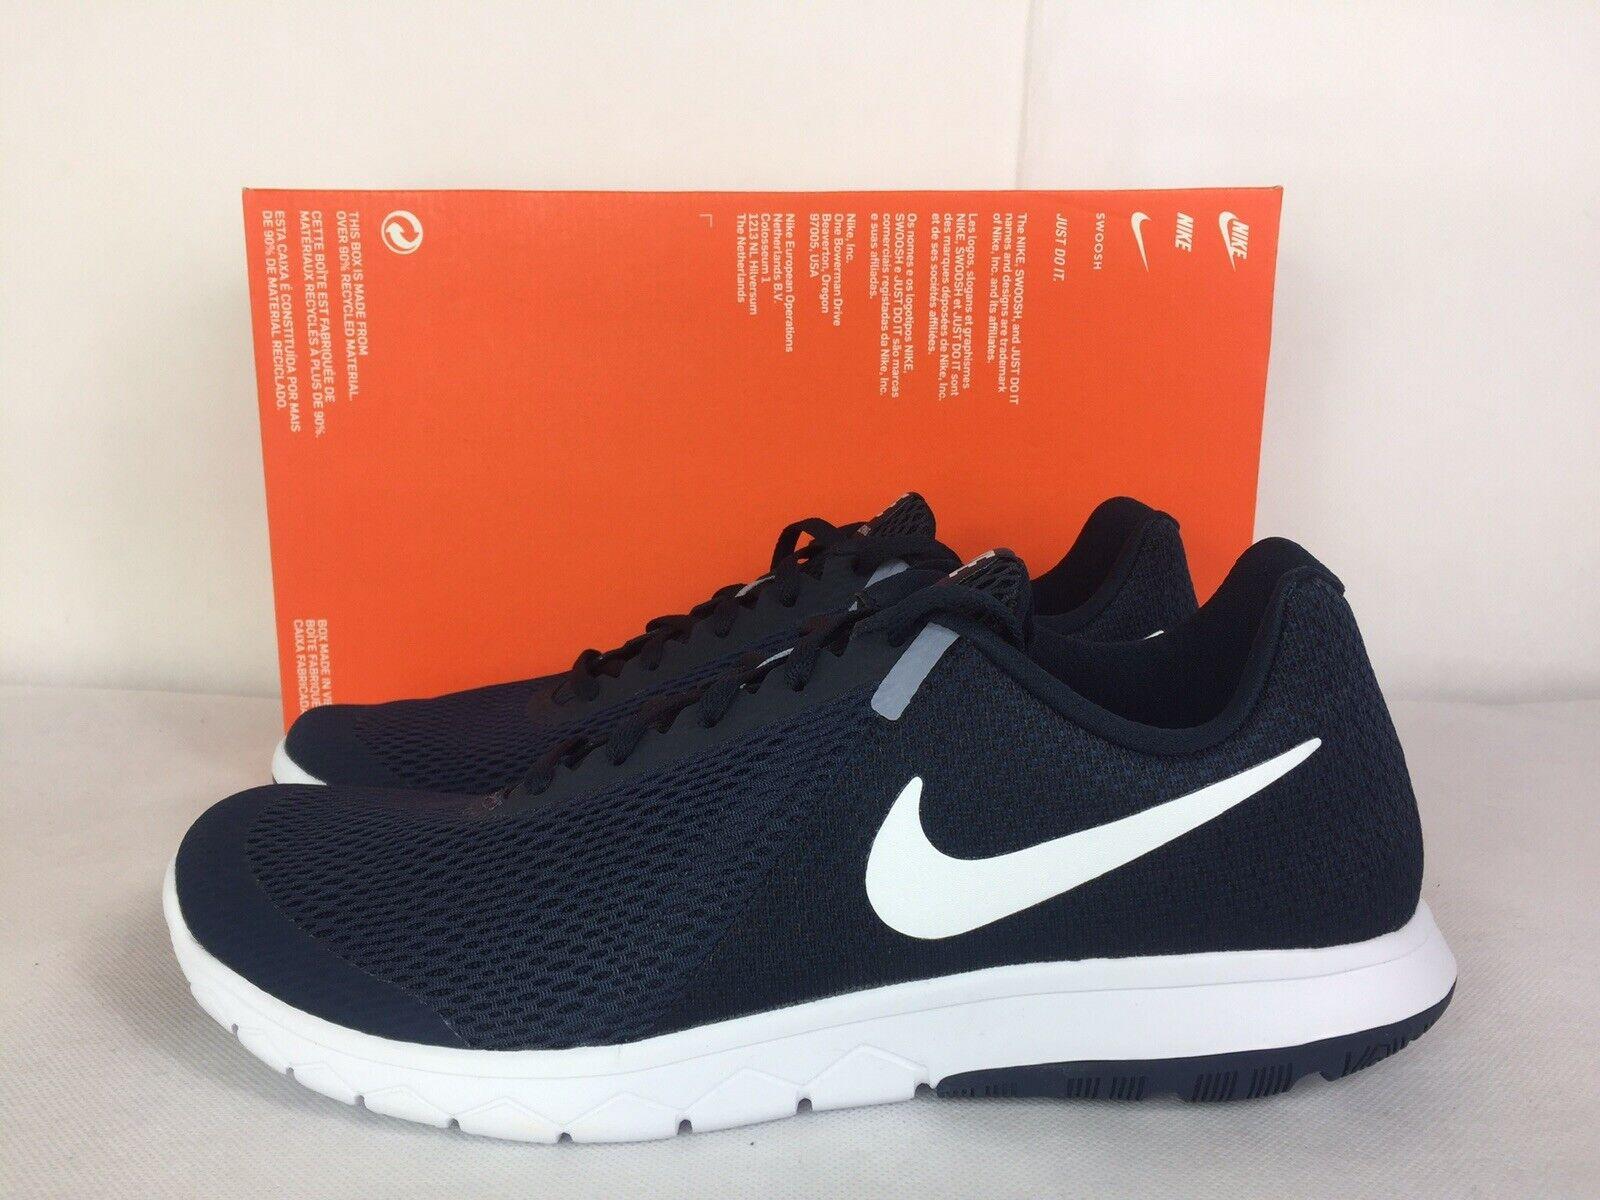 Nike Flex Experience RN 6 Running shoes Men Size 9 bluee Dark Obsidian 881802 403